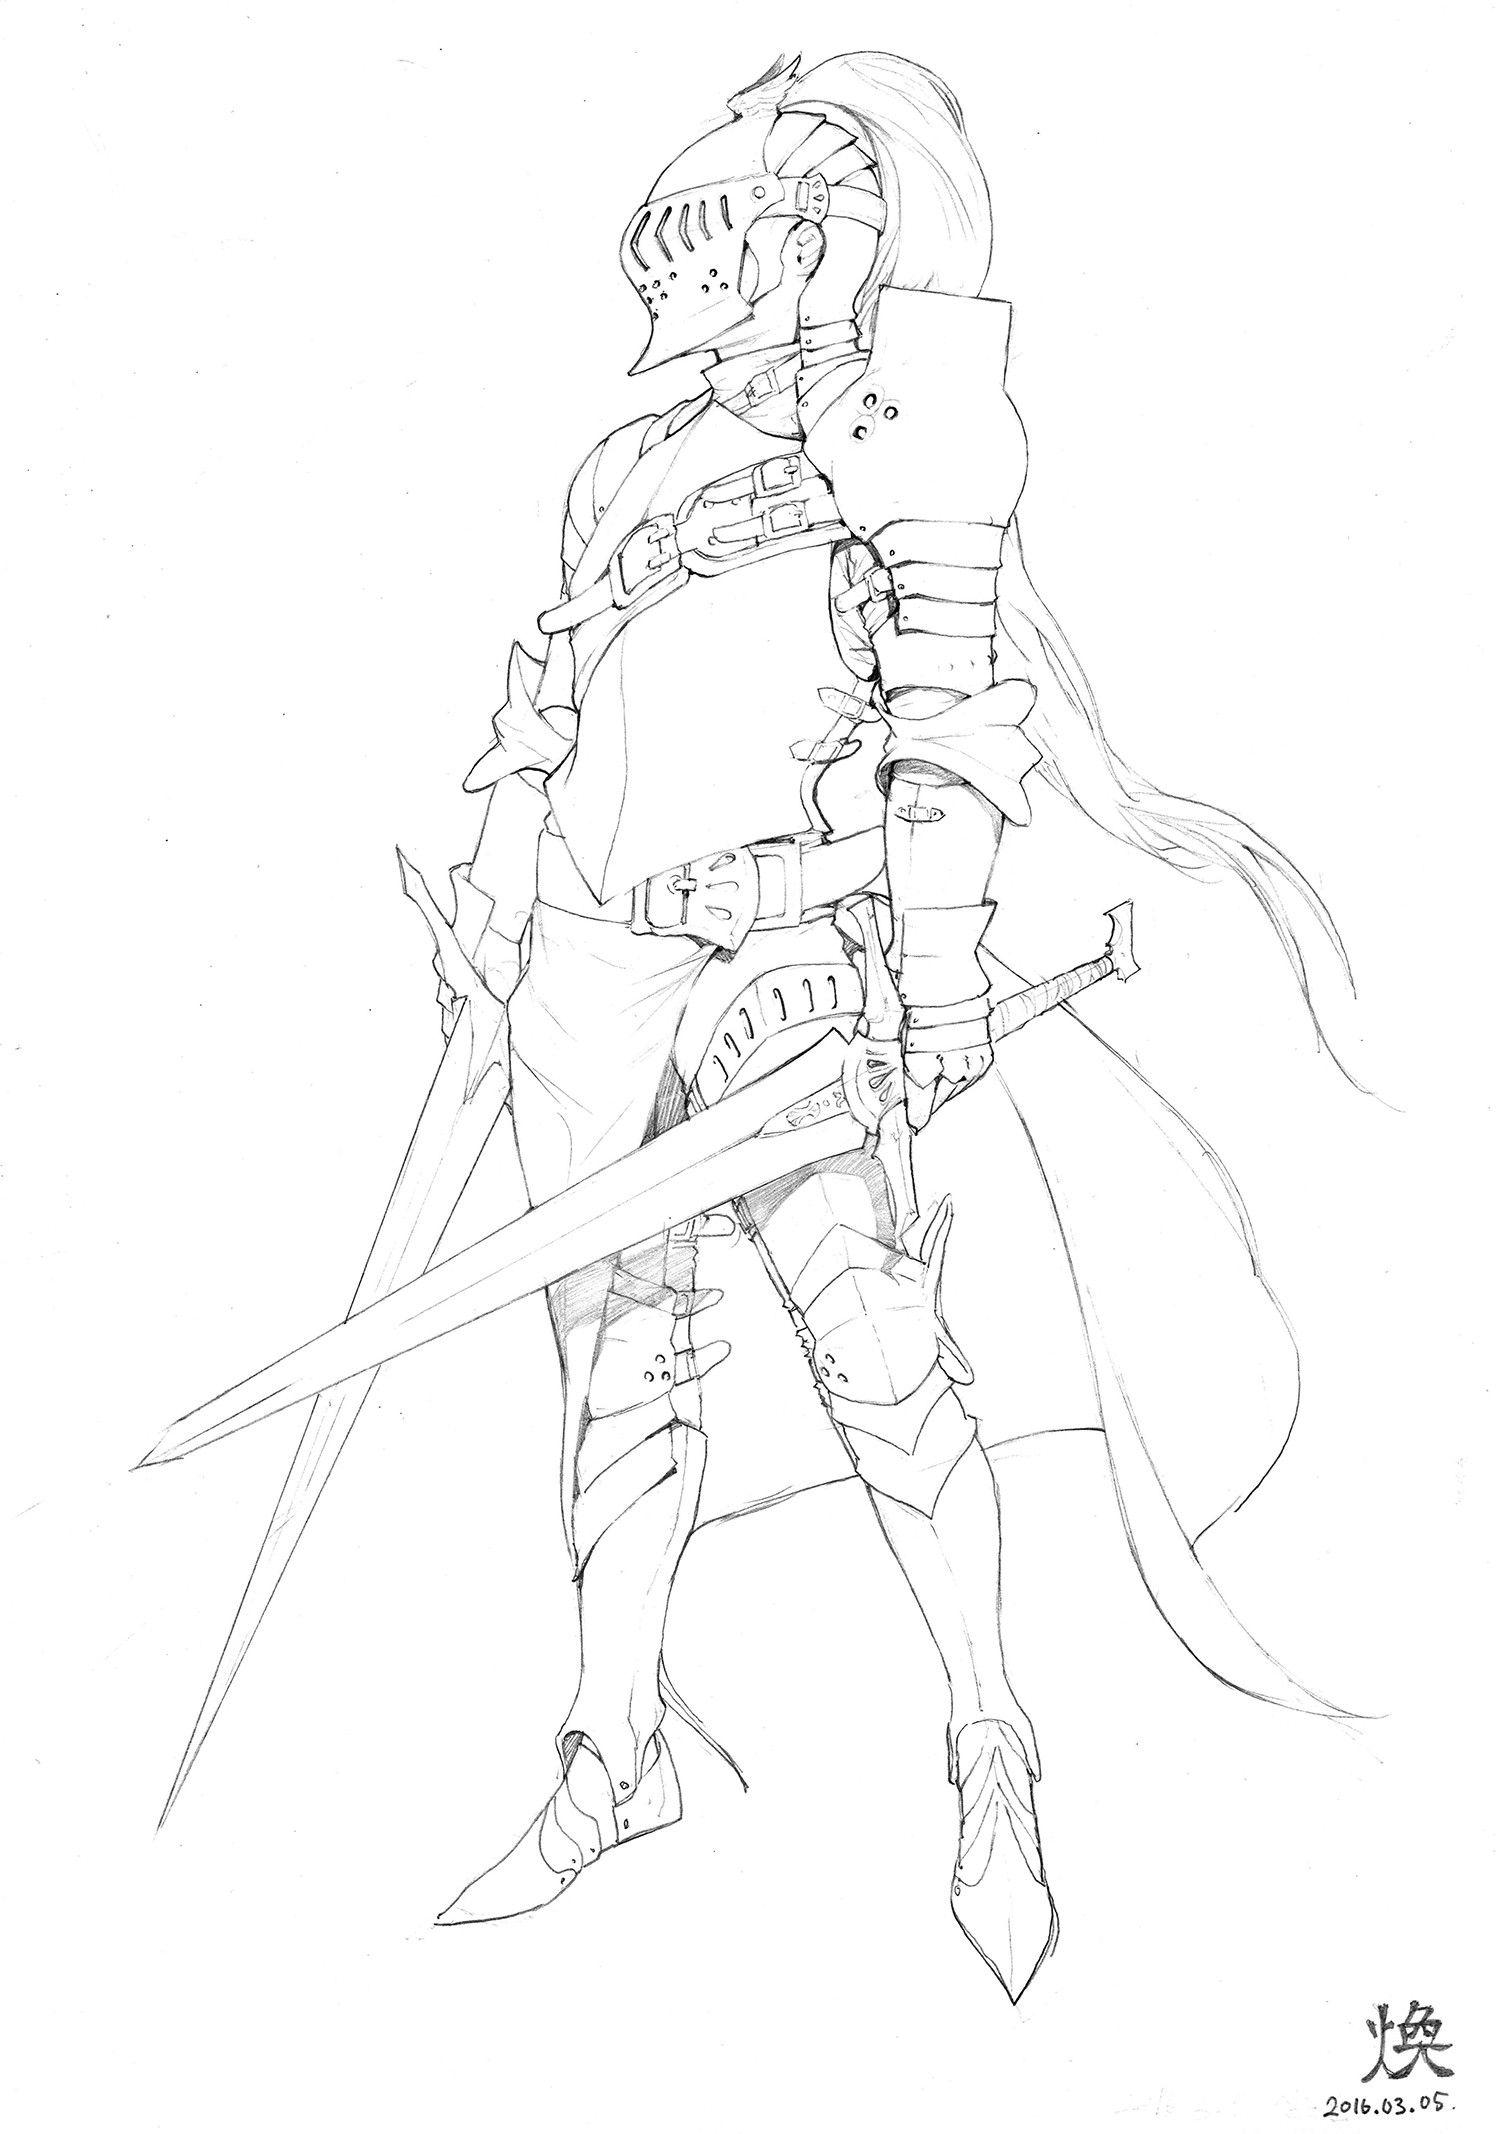 Artstation pencil drawings hwan 煥